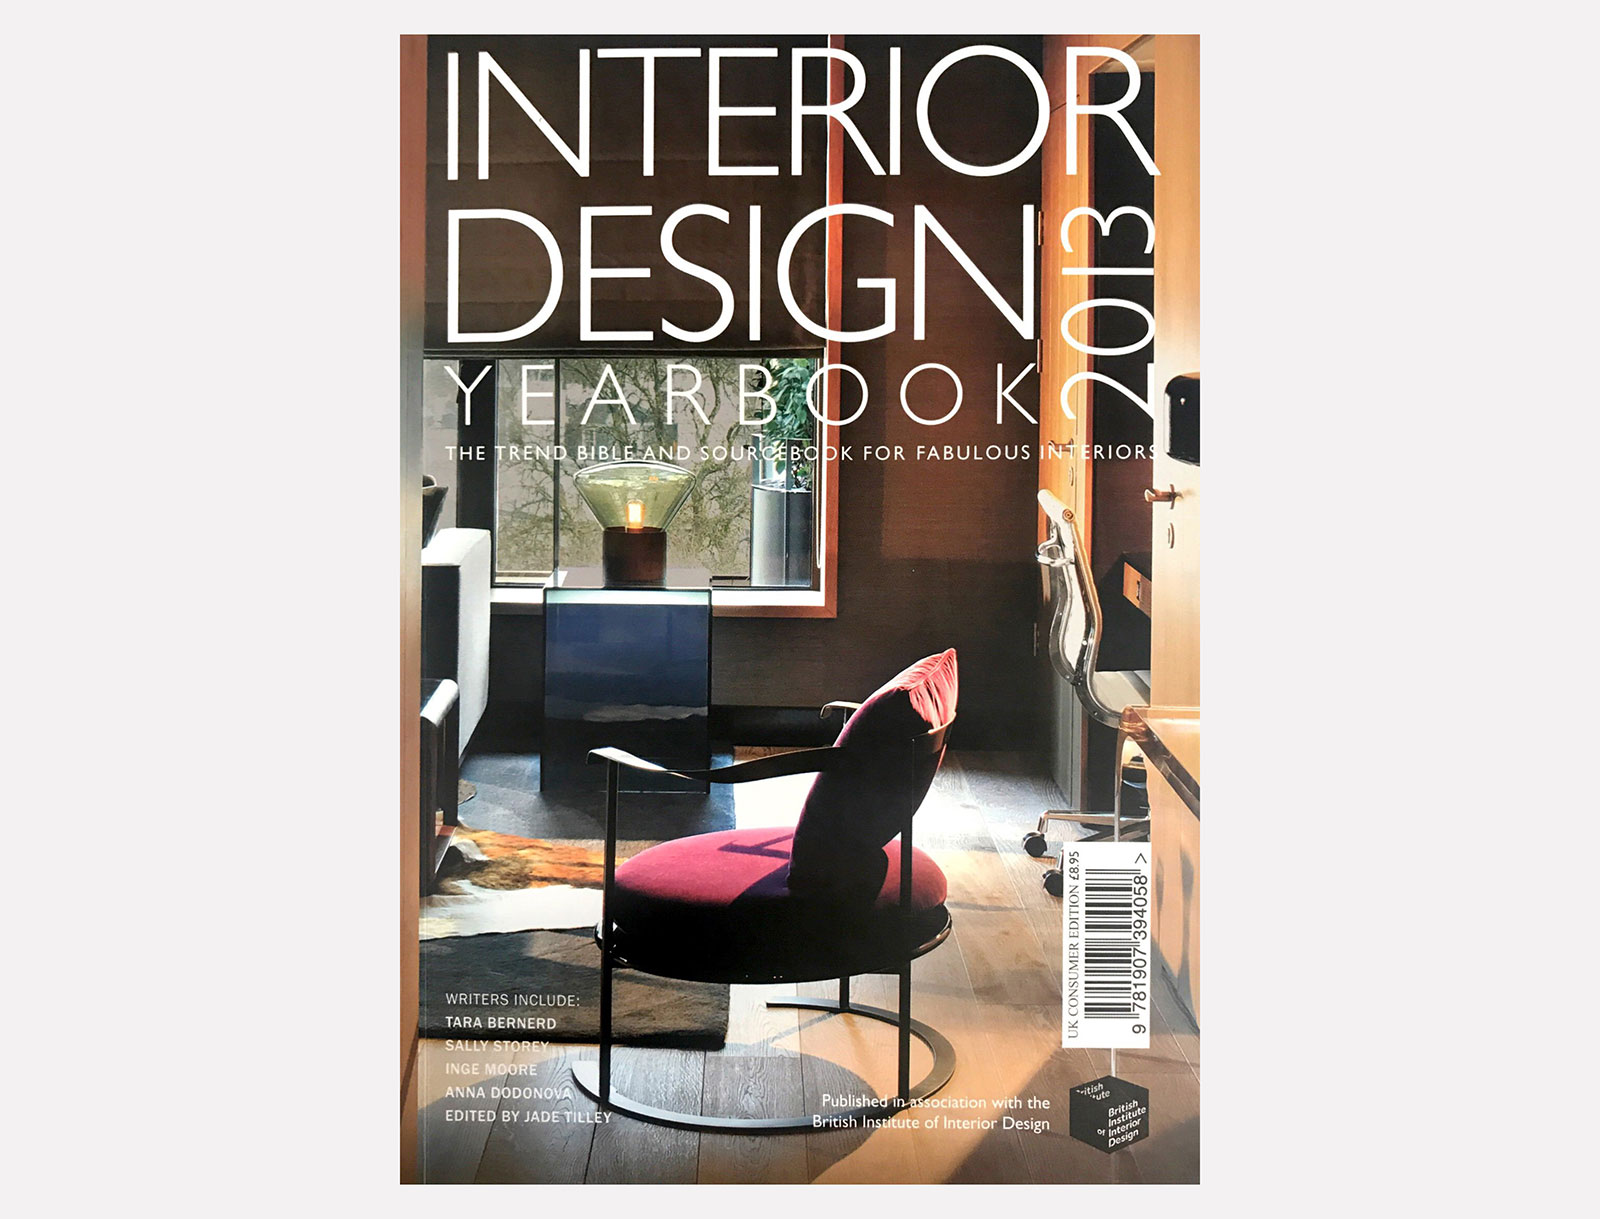 INTERIOR DESIGN YEARBOOK – 2013